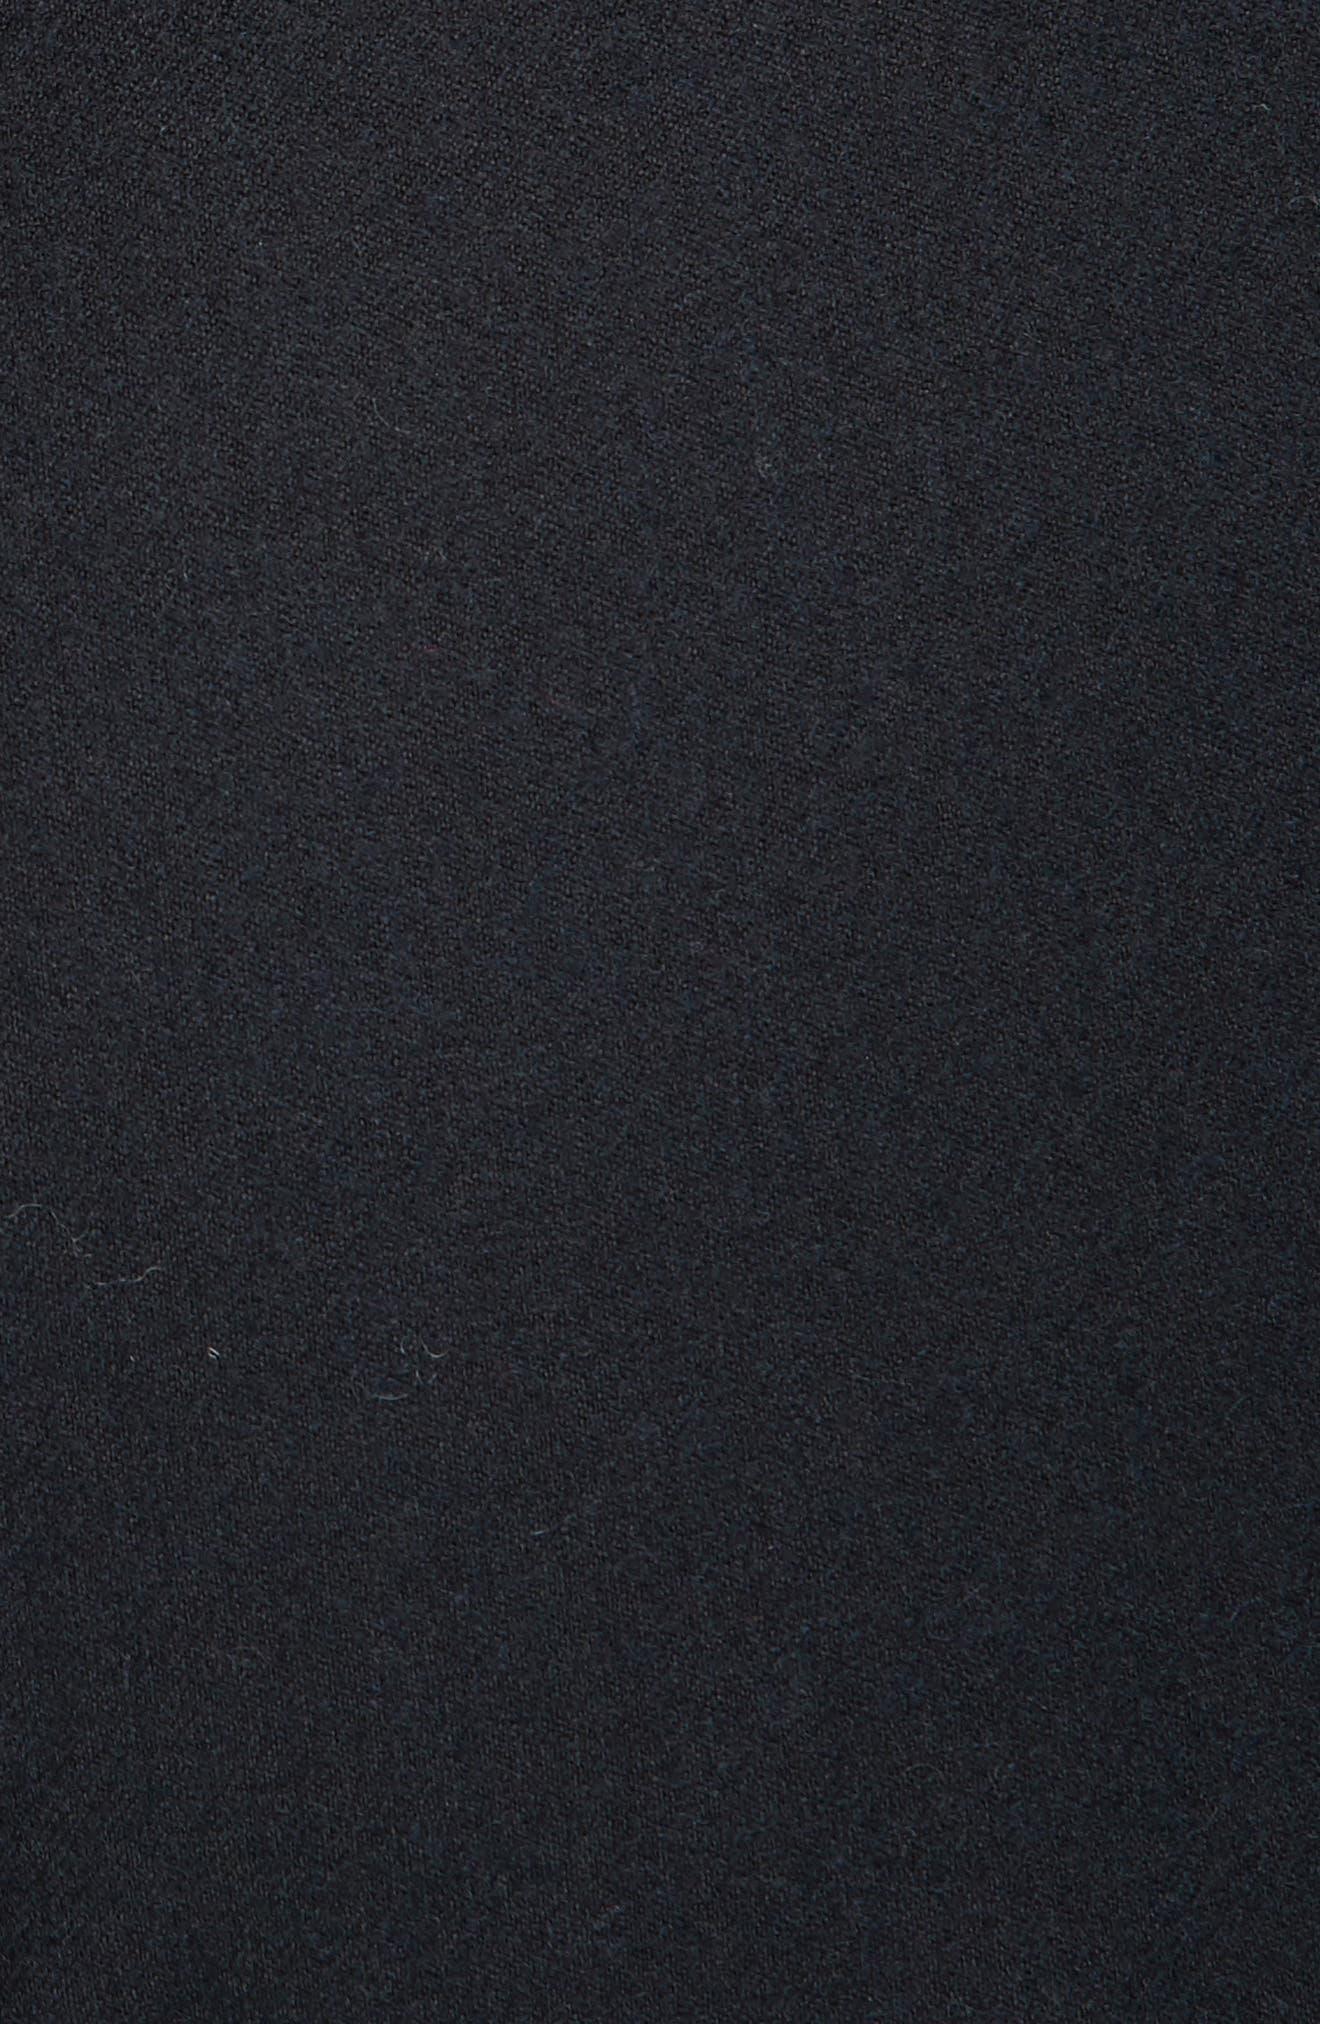 Wool Blend Flannel Button Cuff Pants,                             Alternate thumbnail 5, color,                             410